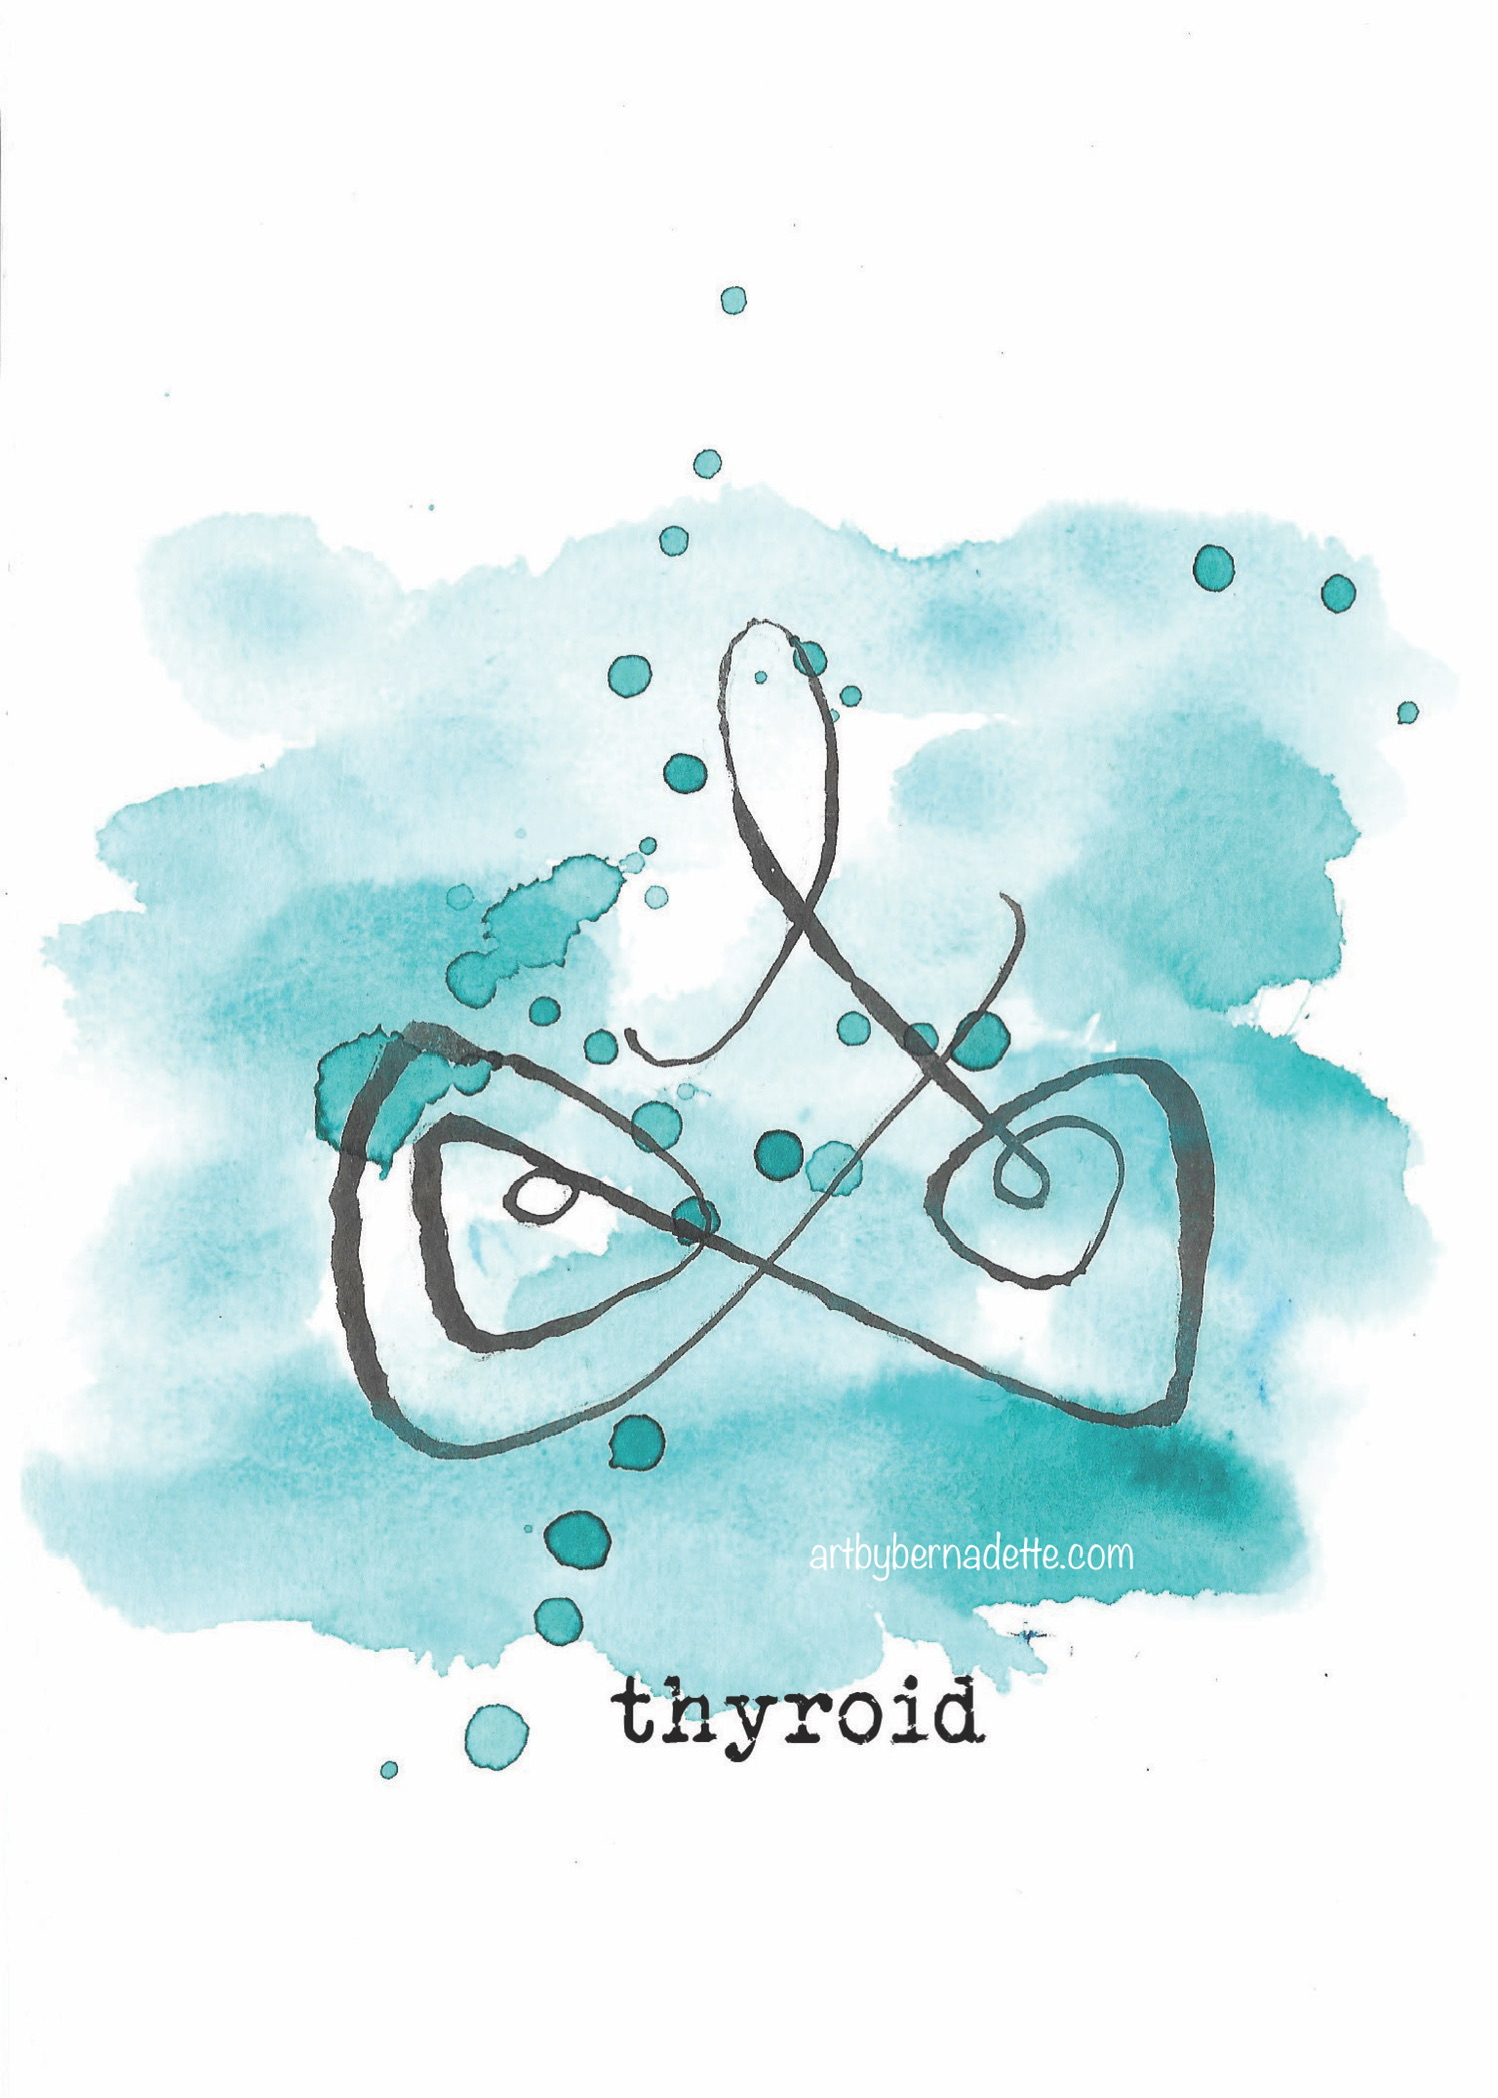 Biogeometry image thyroid 02